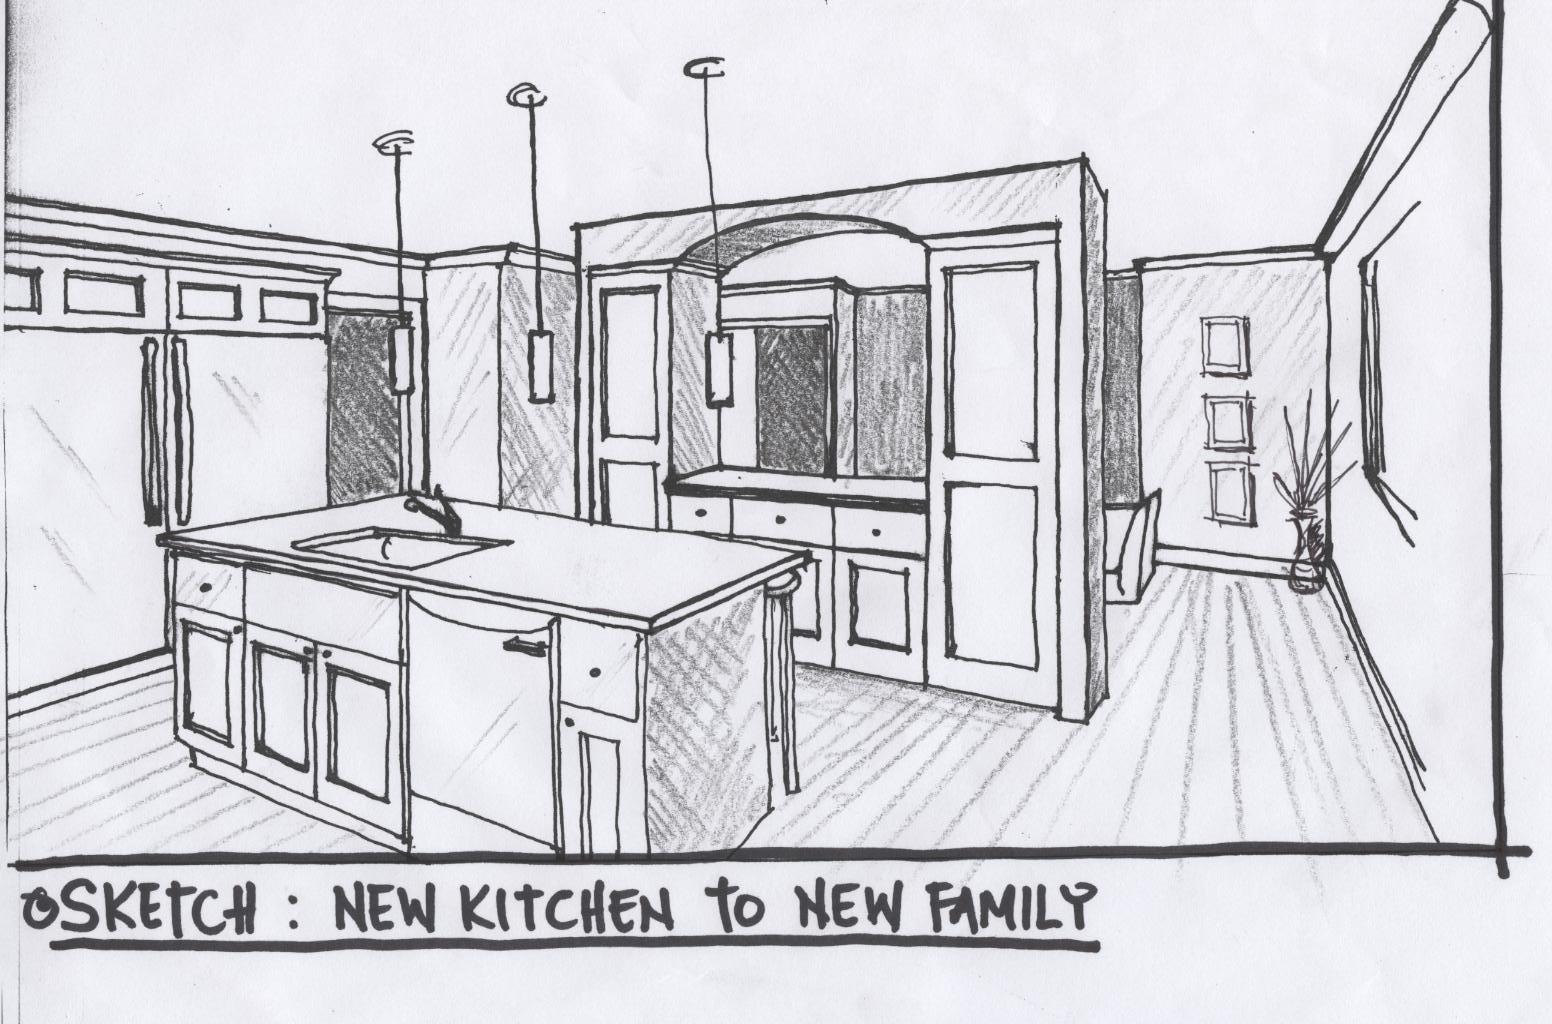 Interior Design Sketches Wallpress 1080p Hd Desktop Interior Design Sketches Ask The Architect